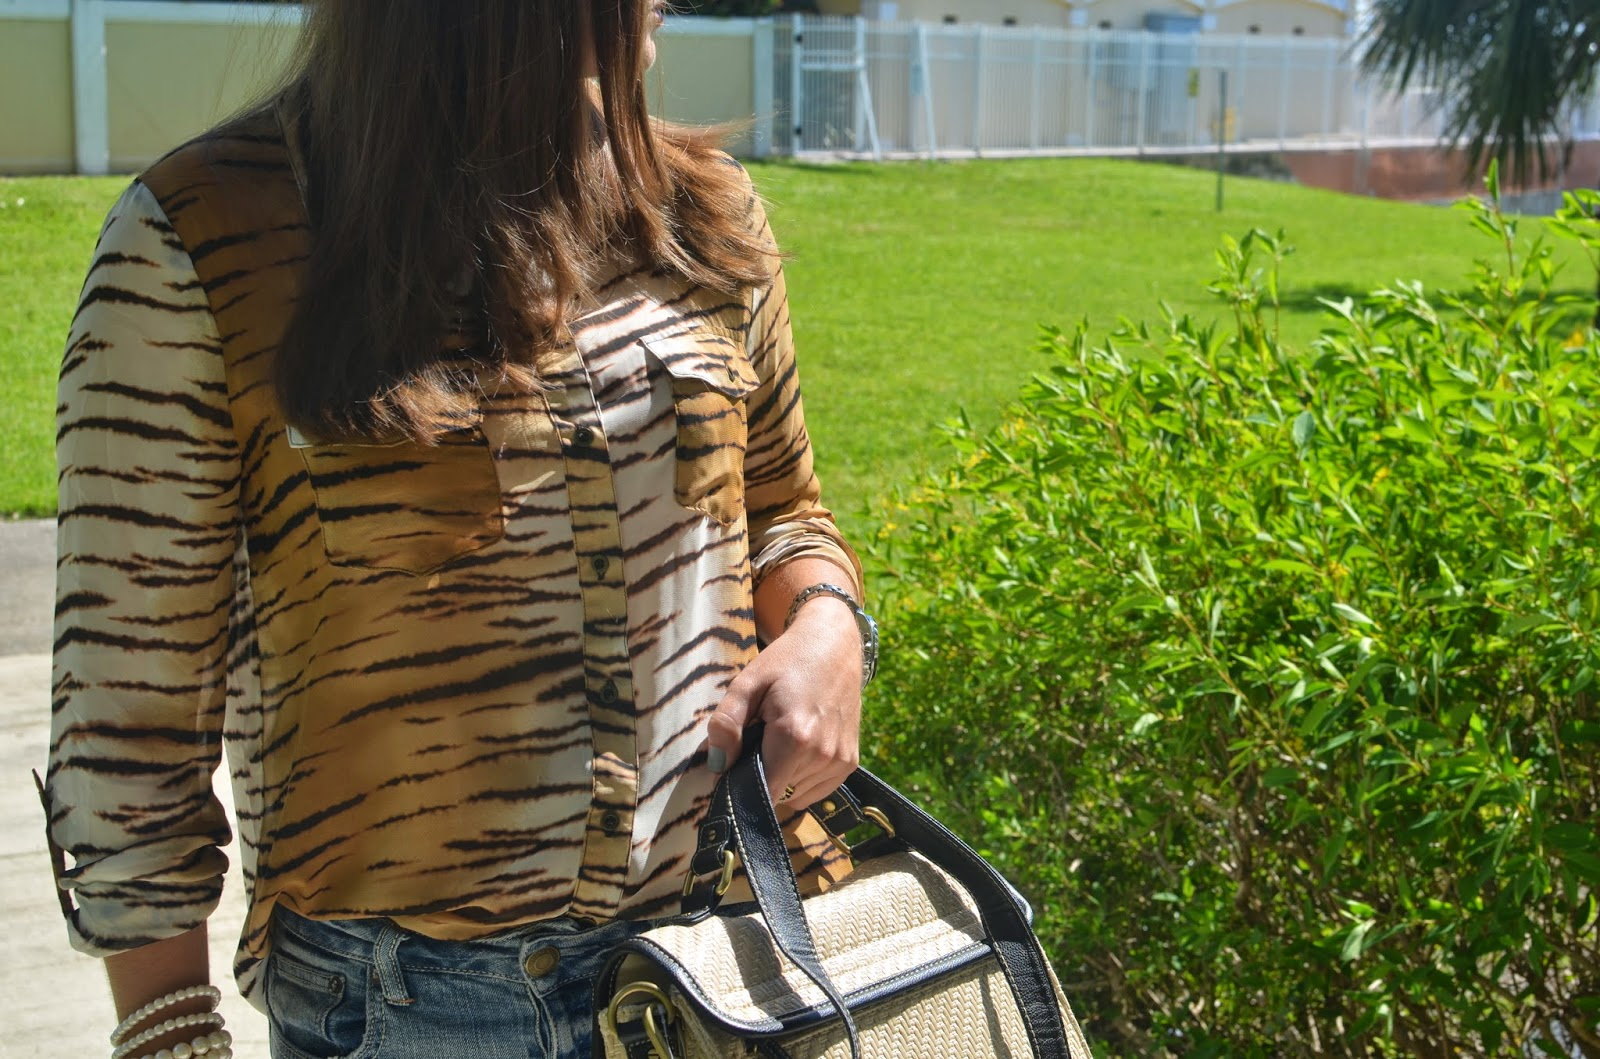 Boyfriend jeans - animal print top - boat shoes - Straw bag - poshmark